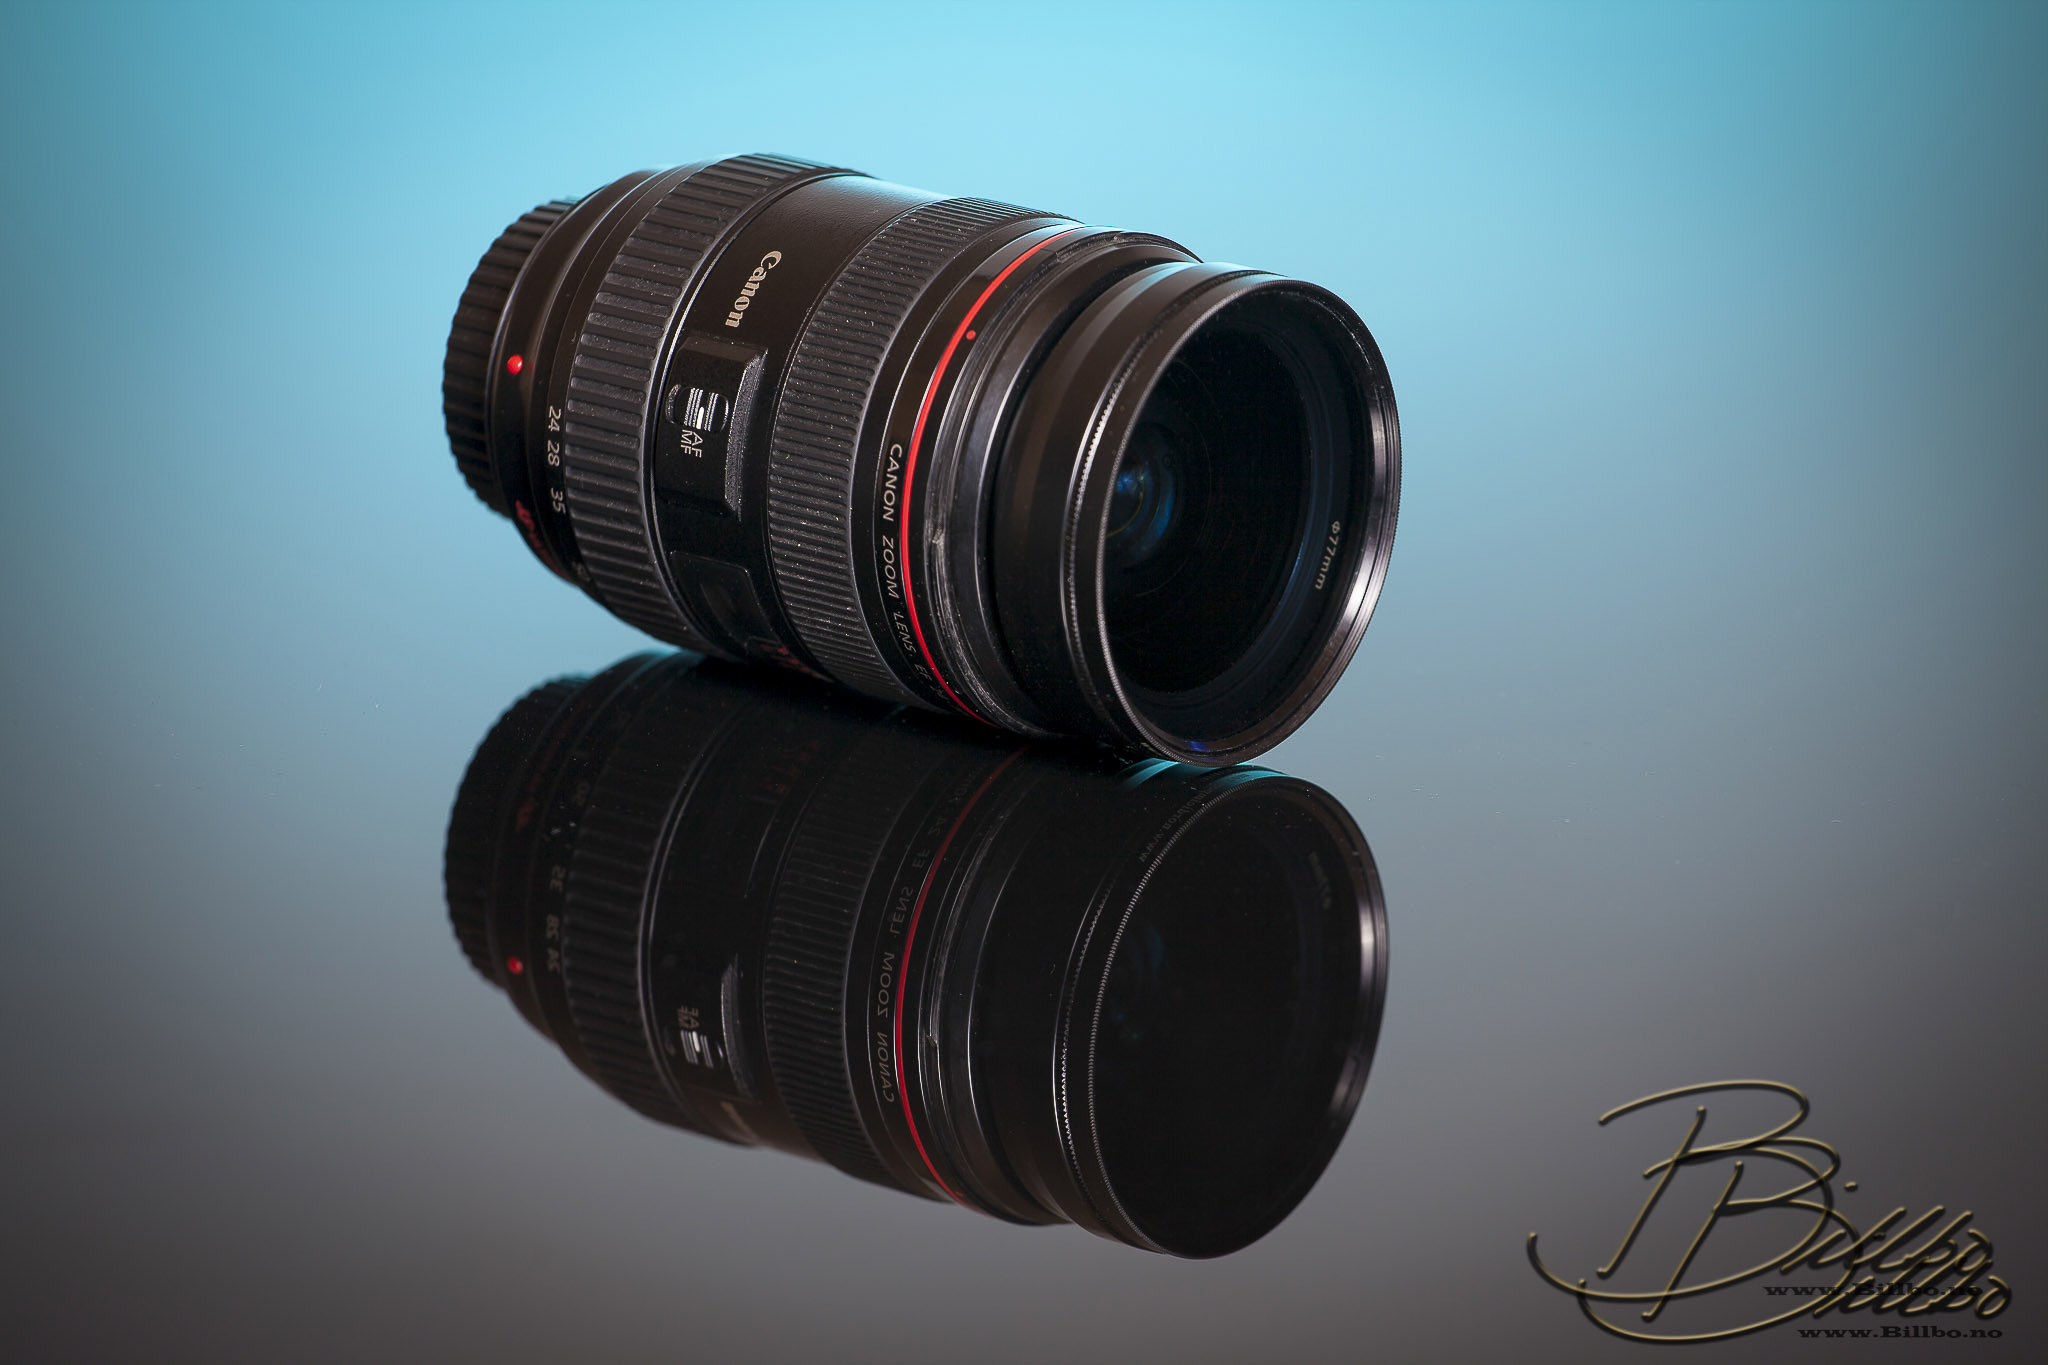 Produktfoto Canon 24-70 f2.8 L